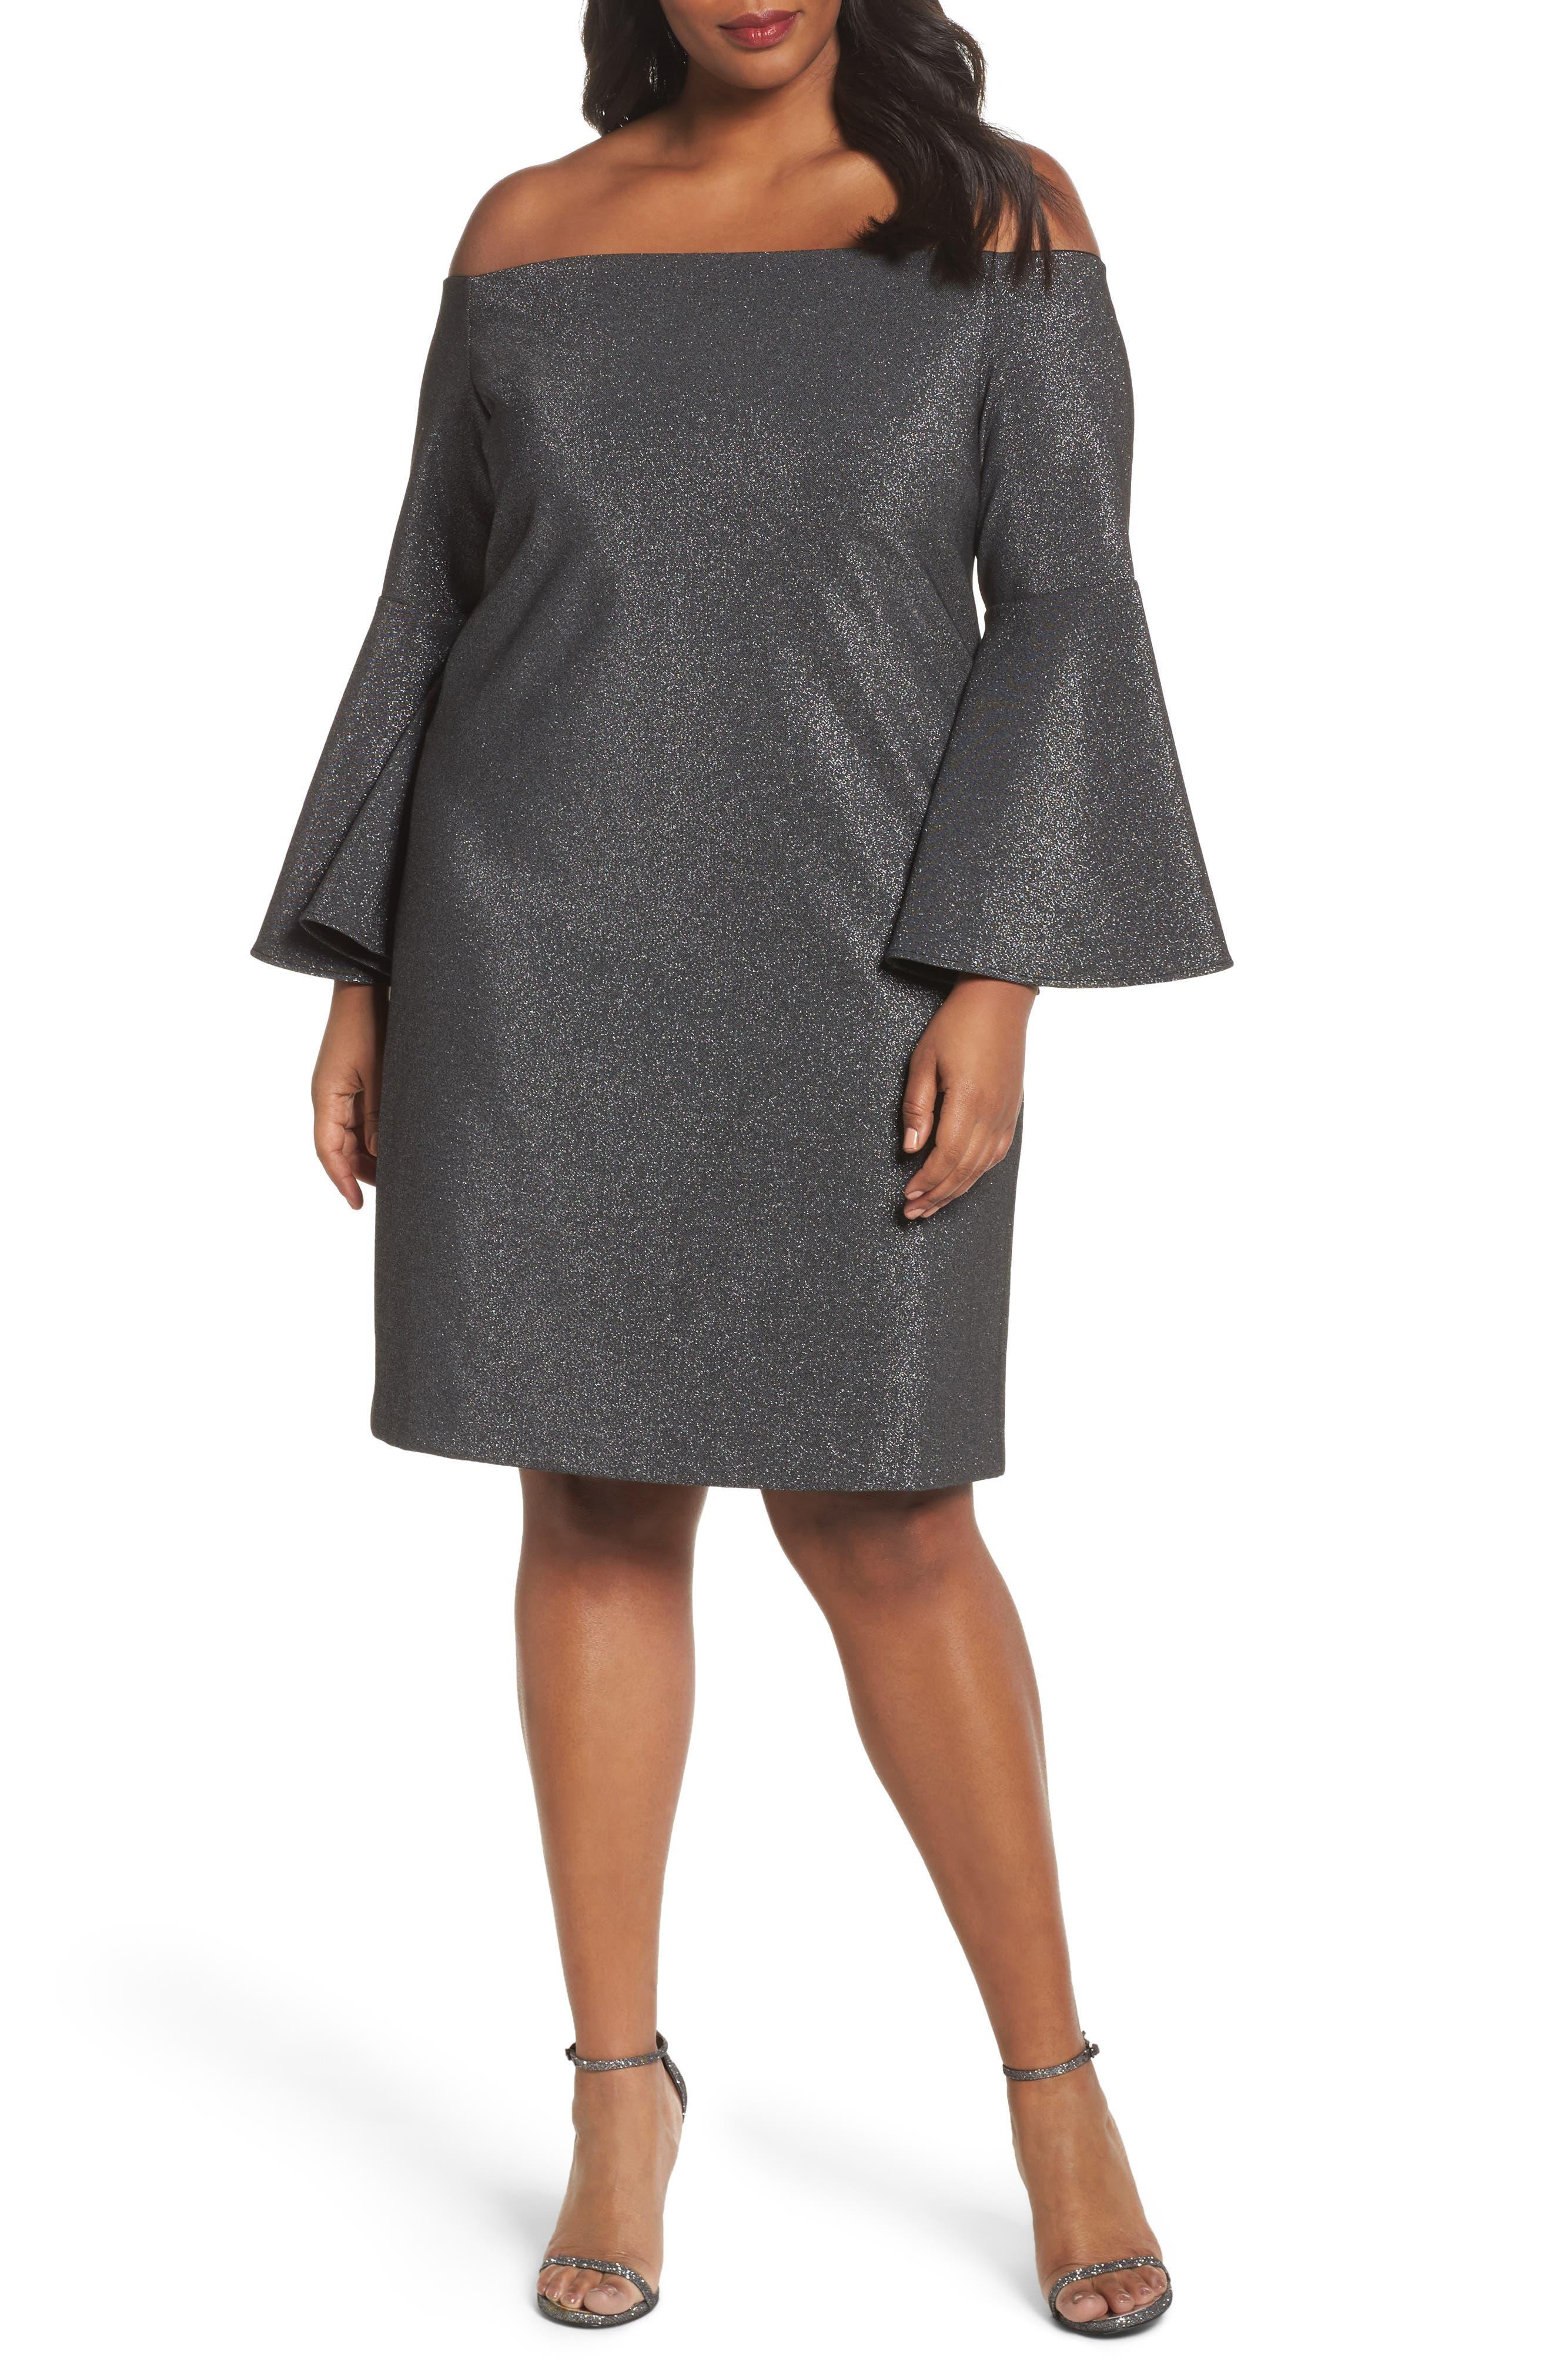 Off the Shoulder Metallic Sheath Dress,                             Main thumbnail 1, color,                             Rich Black